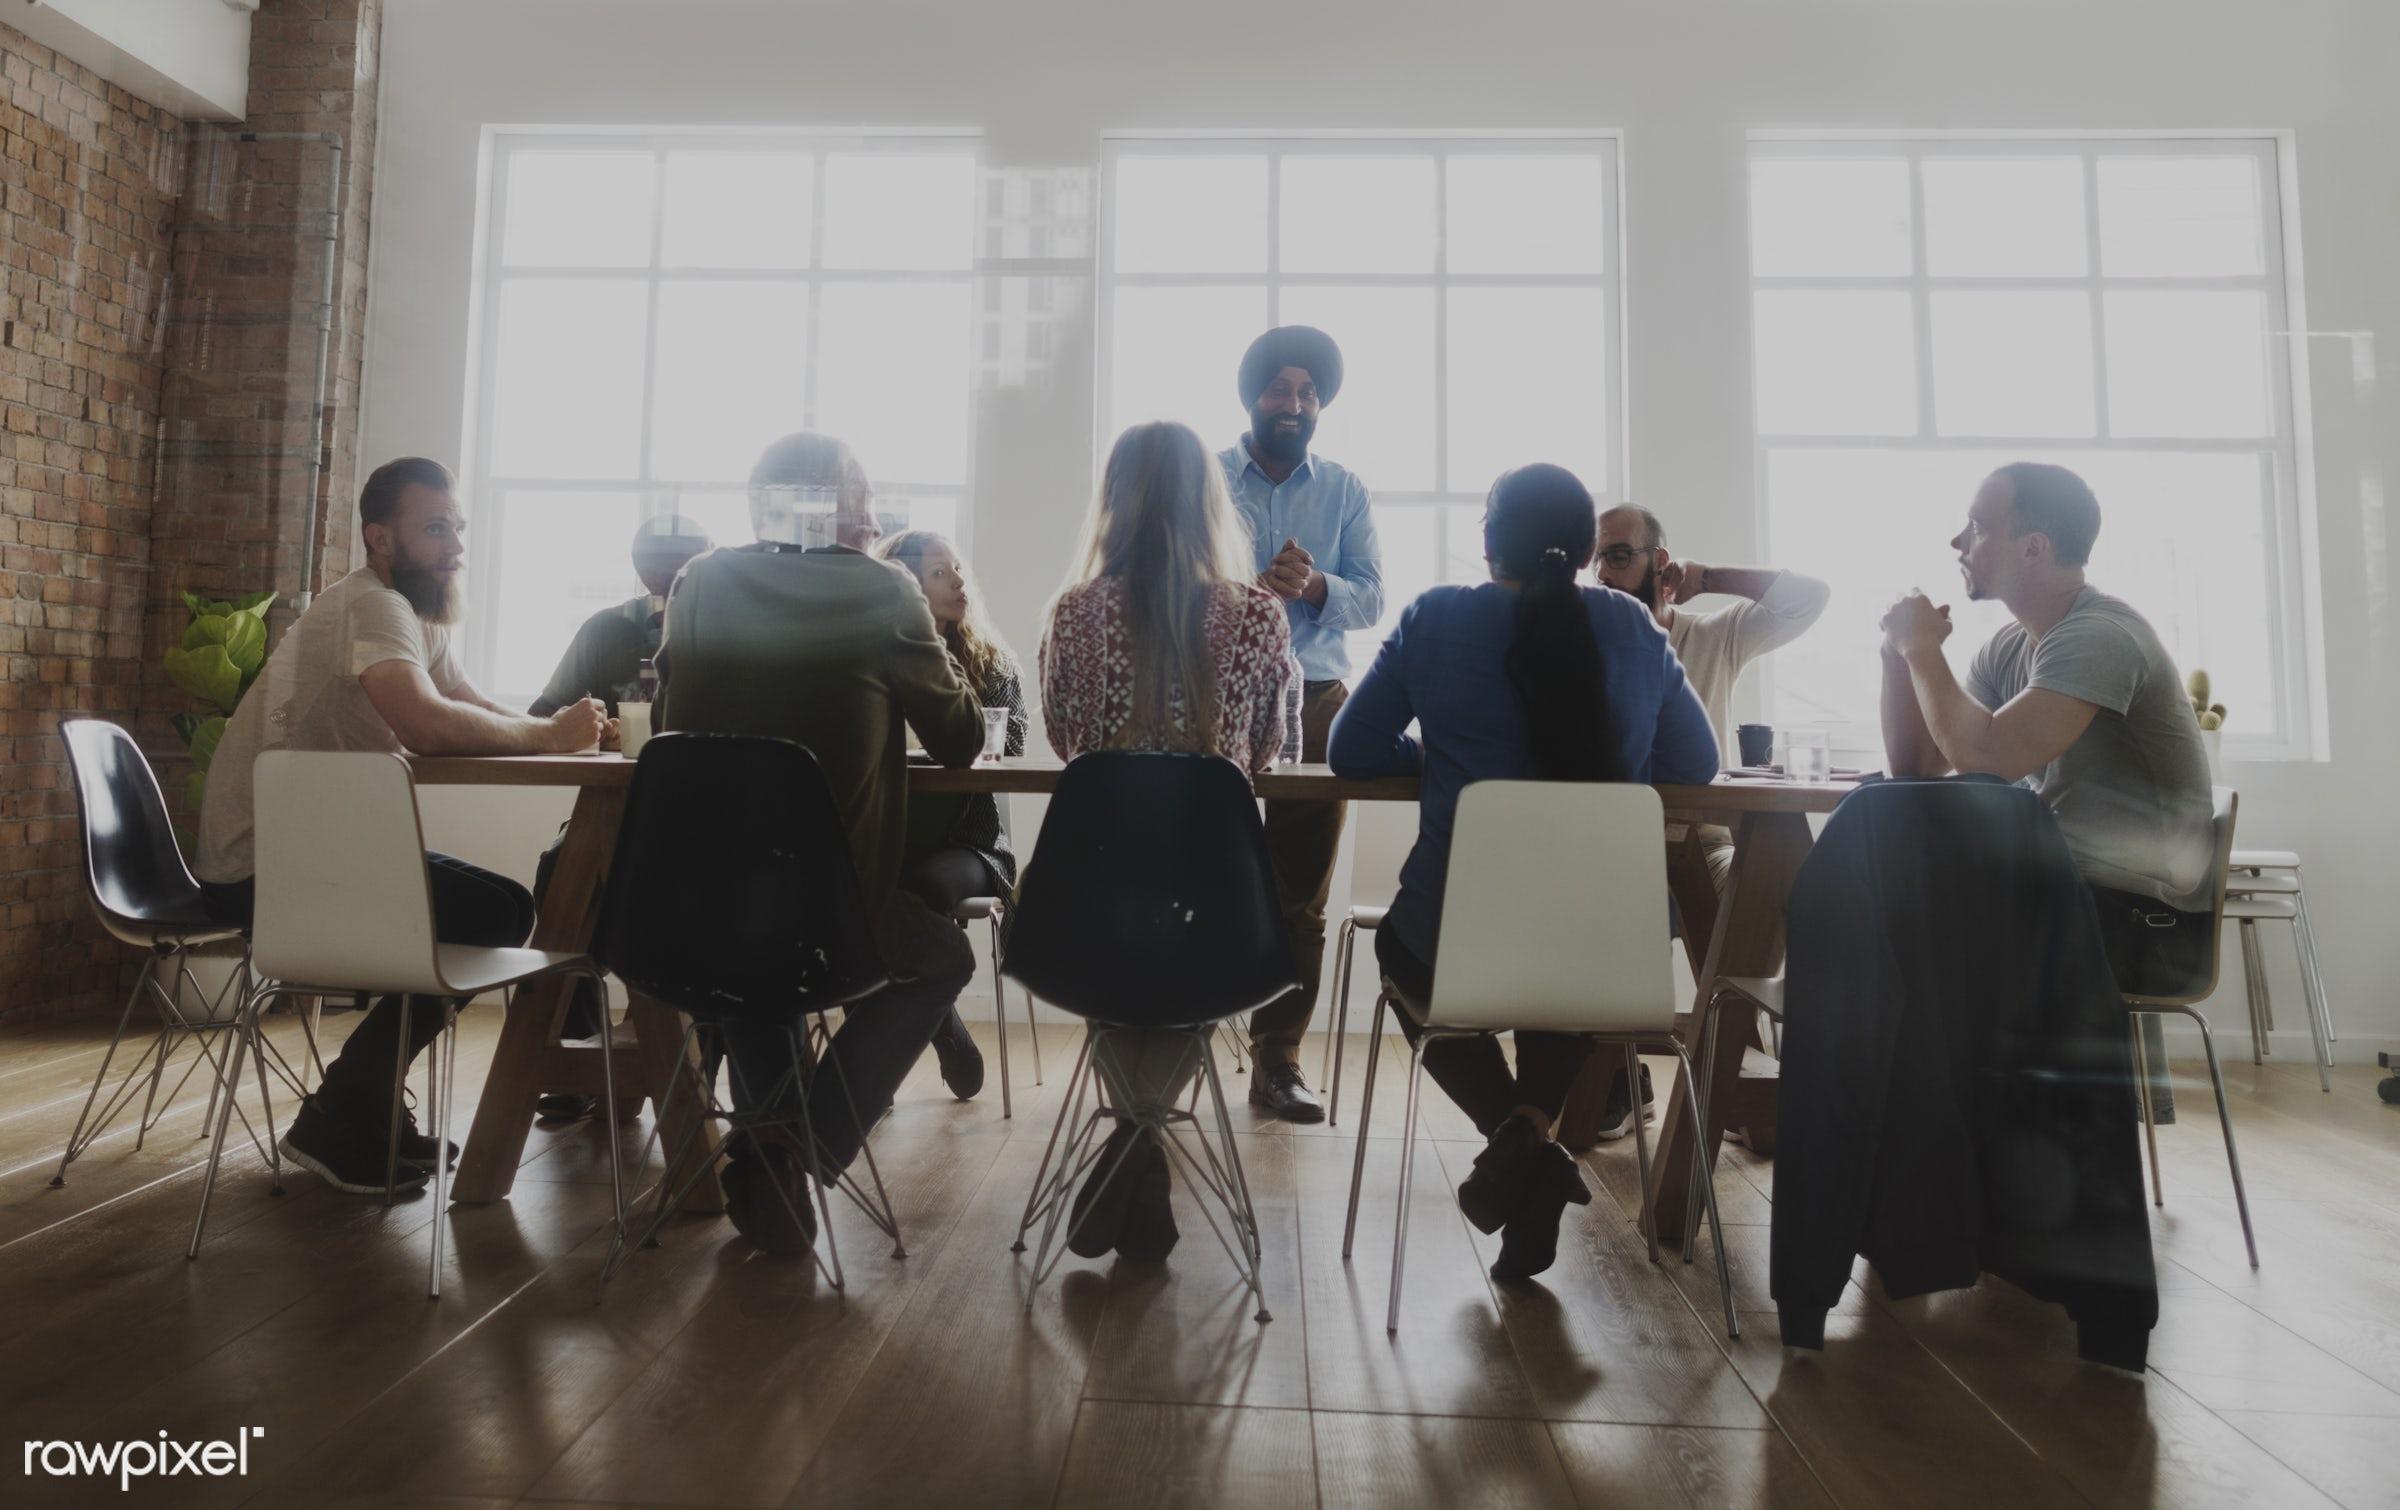 Diverse people teamwork on meeting table - discussion, diverse, people, together, business, teamwork, share, friends,...